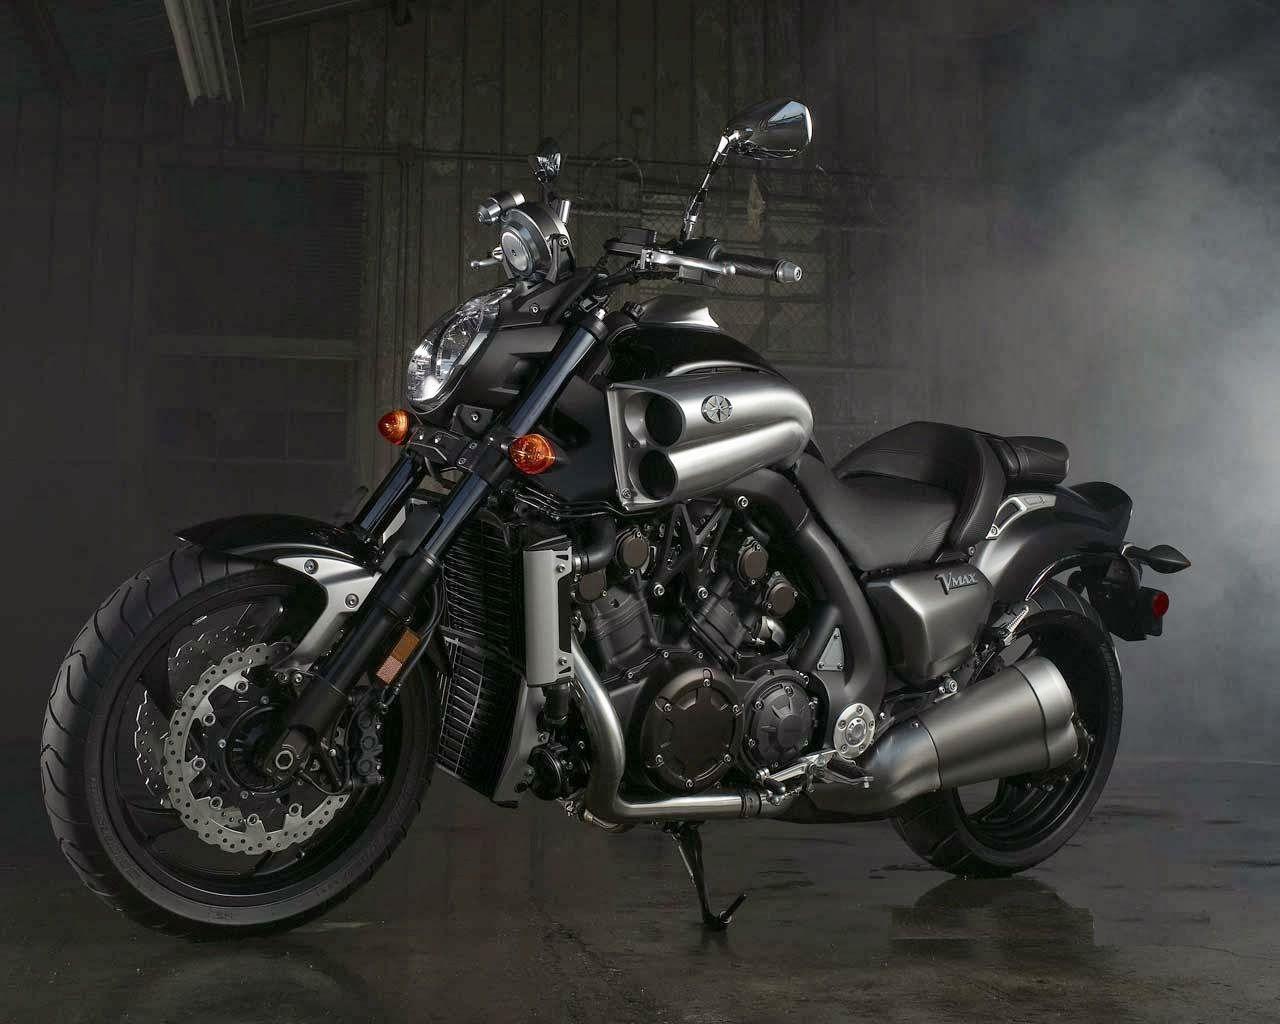 Pin by Zahid Ali on HD Wallpapers | Yamaha, Motorcycle news